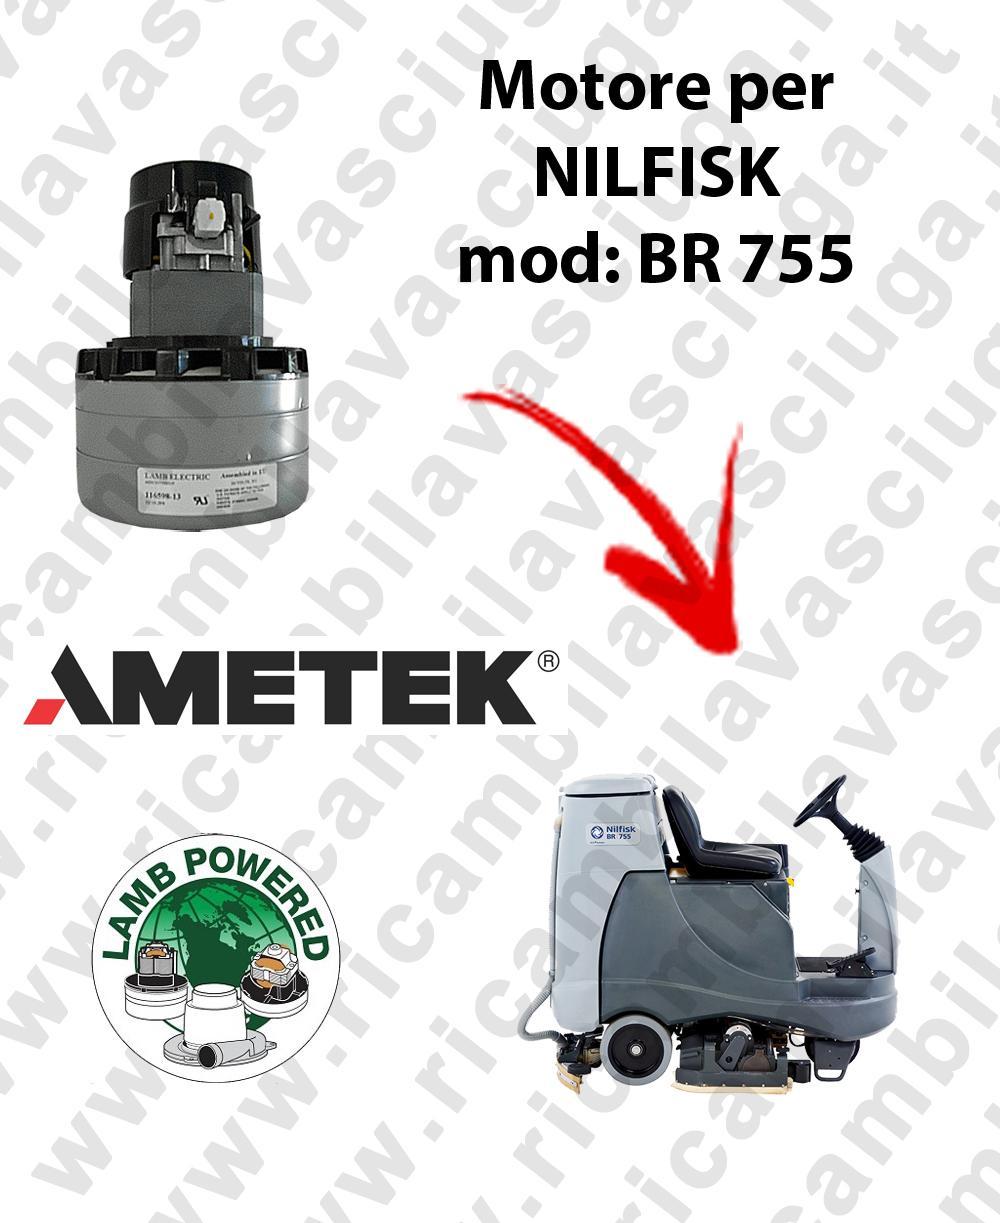 BR 755 MOTORE aspirazione LAMB AMETEK per lavapavimenti NILFISK